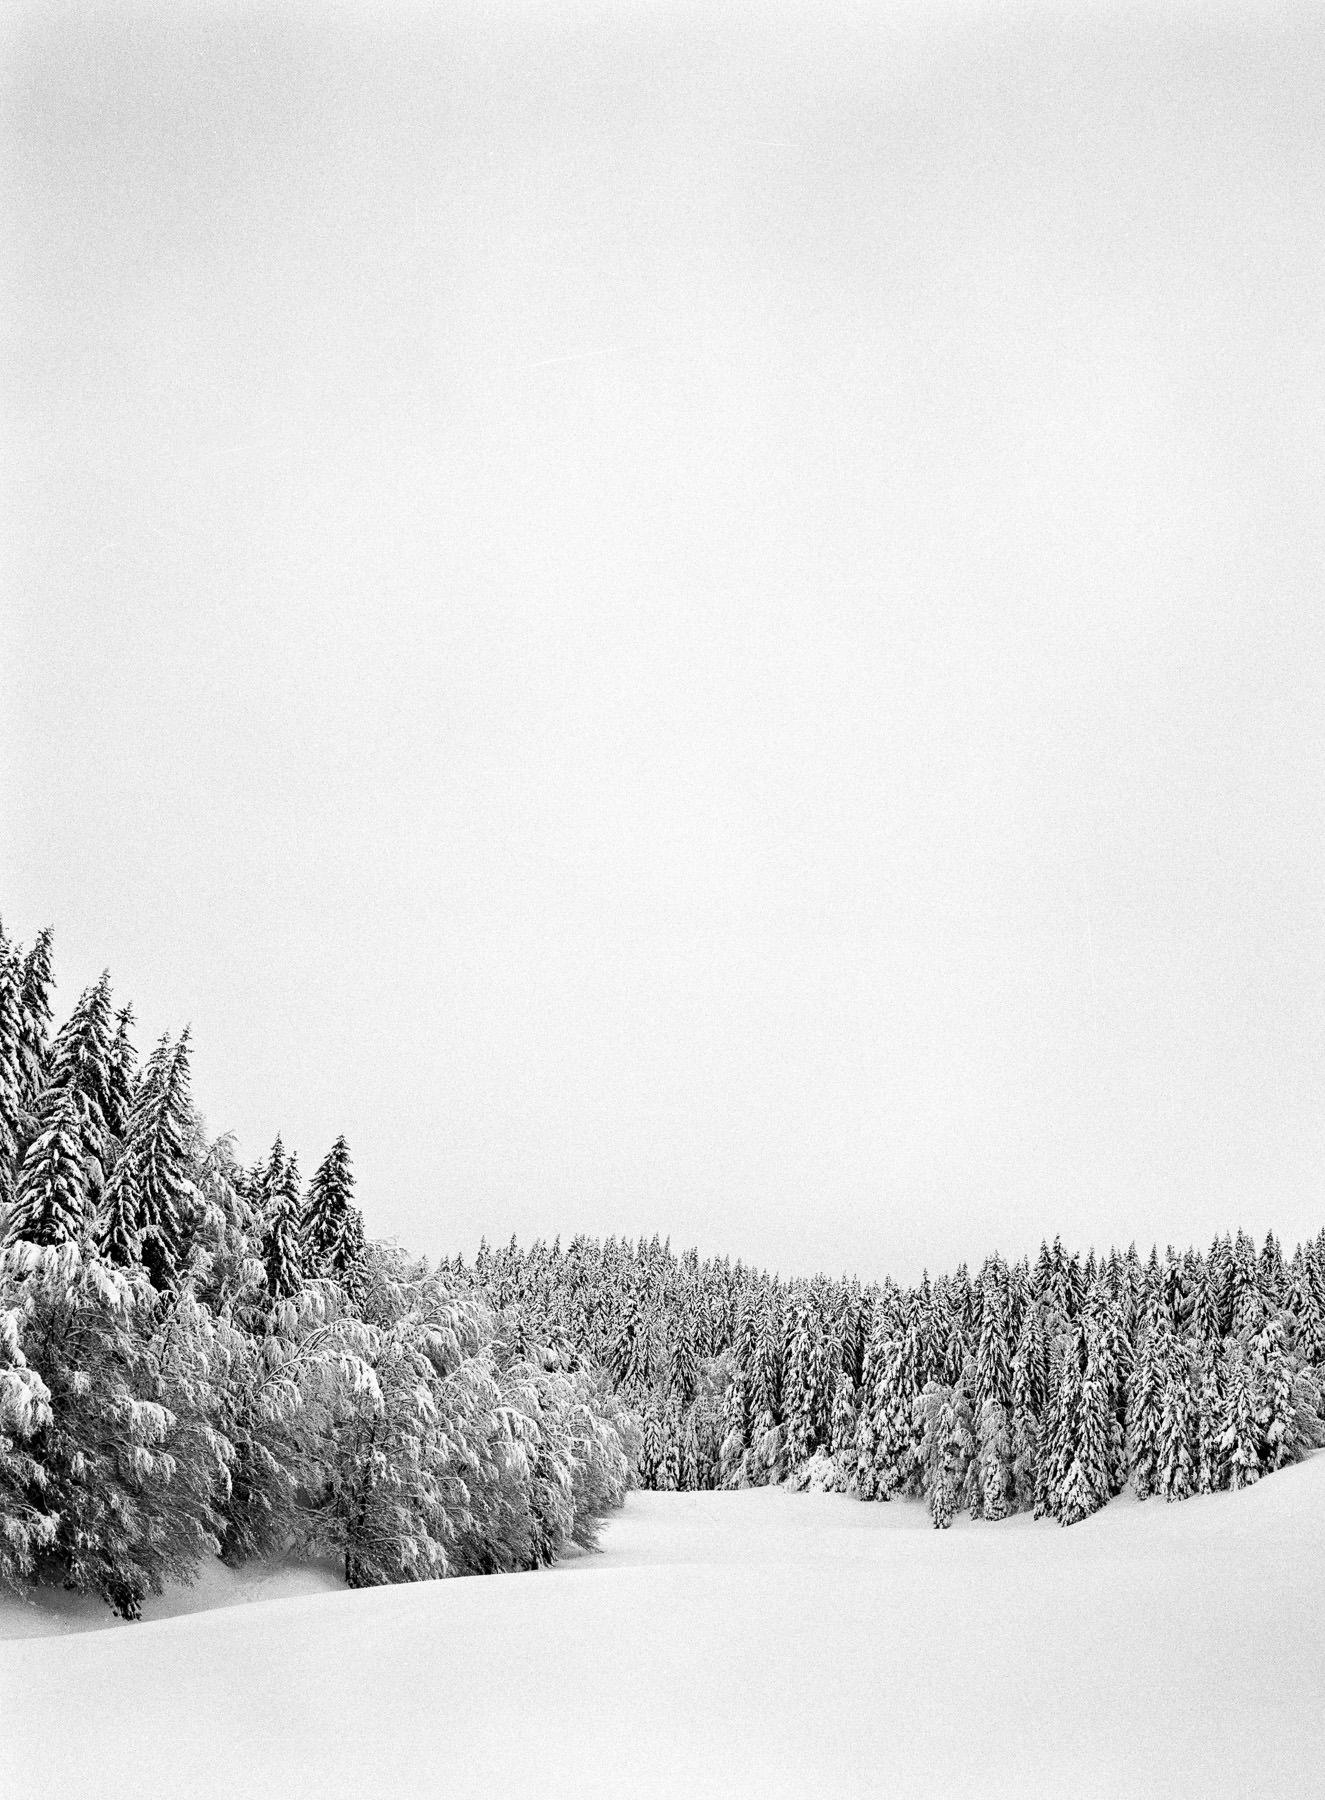 Balade au Revard sous la neige, HP5 + Fuji GA 645 moyen format